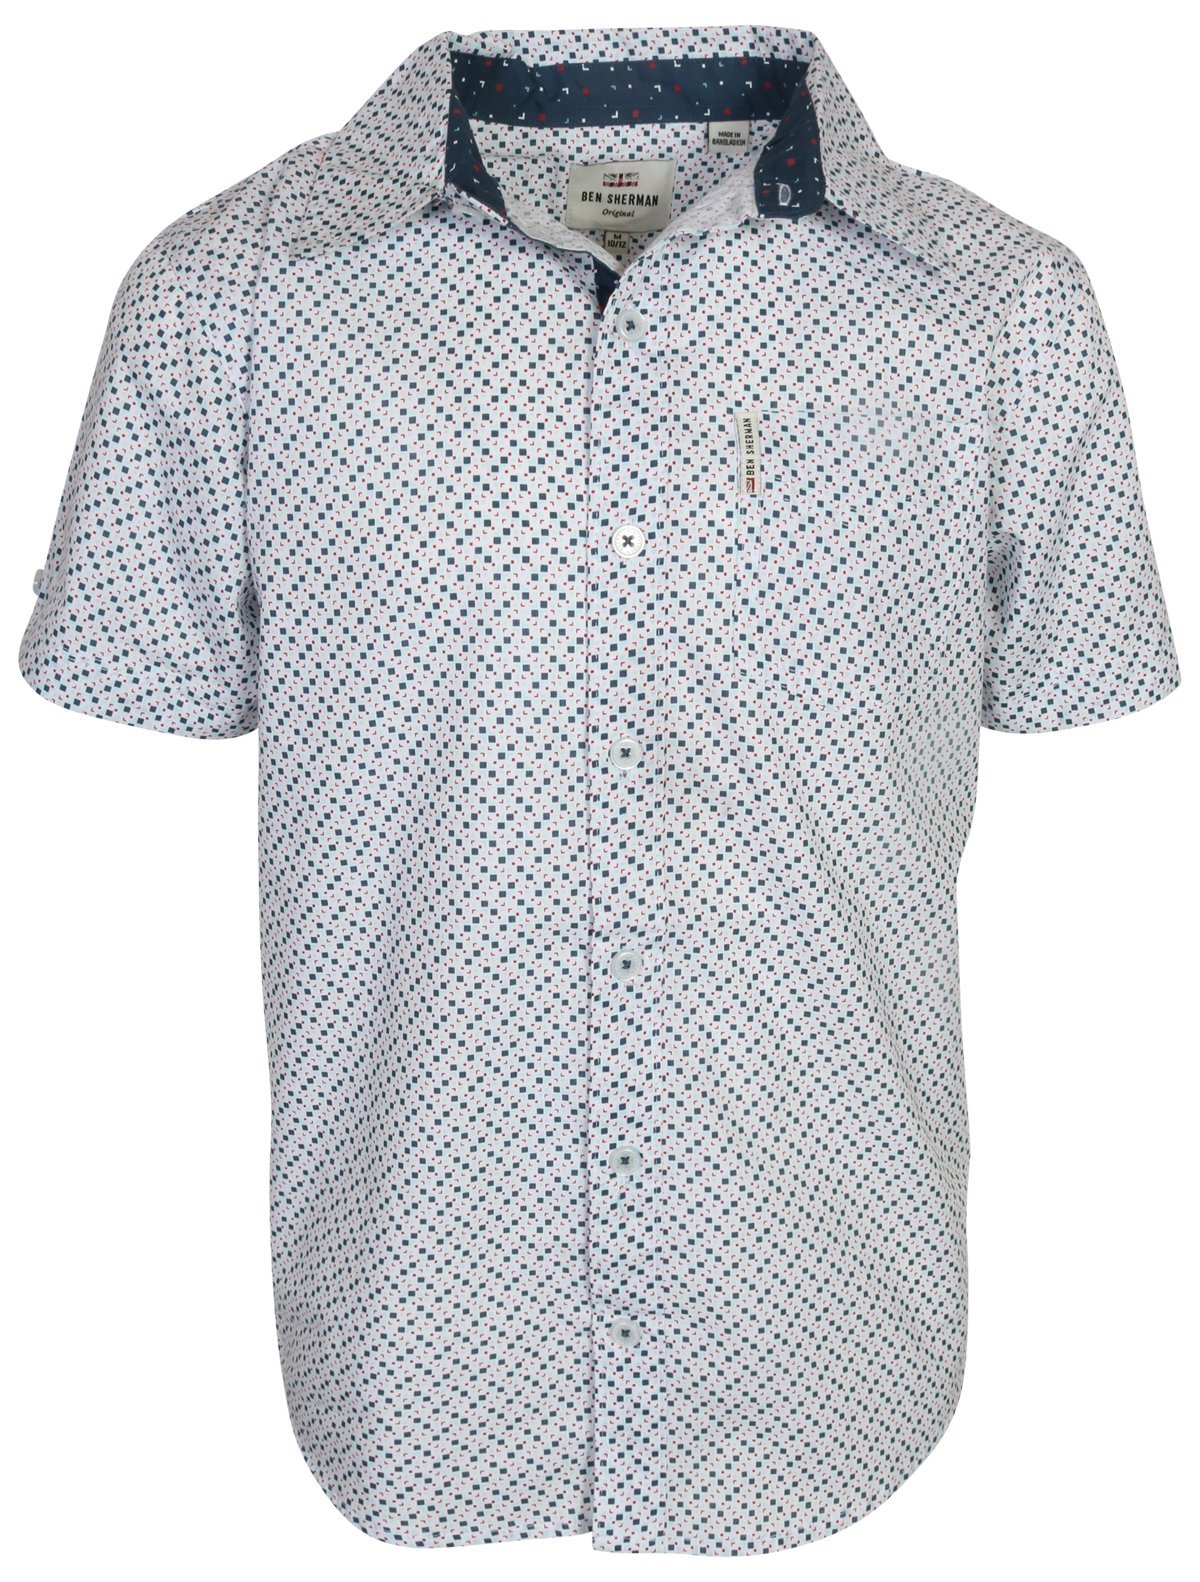 NEVER SKY Bassnectar Round Yellow Adult Mens Essentials T-Shirt Cotton Crewneck